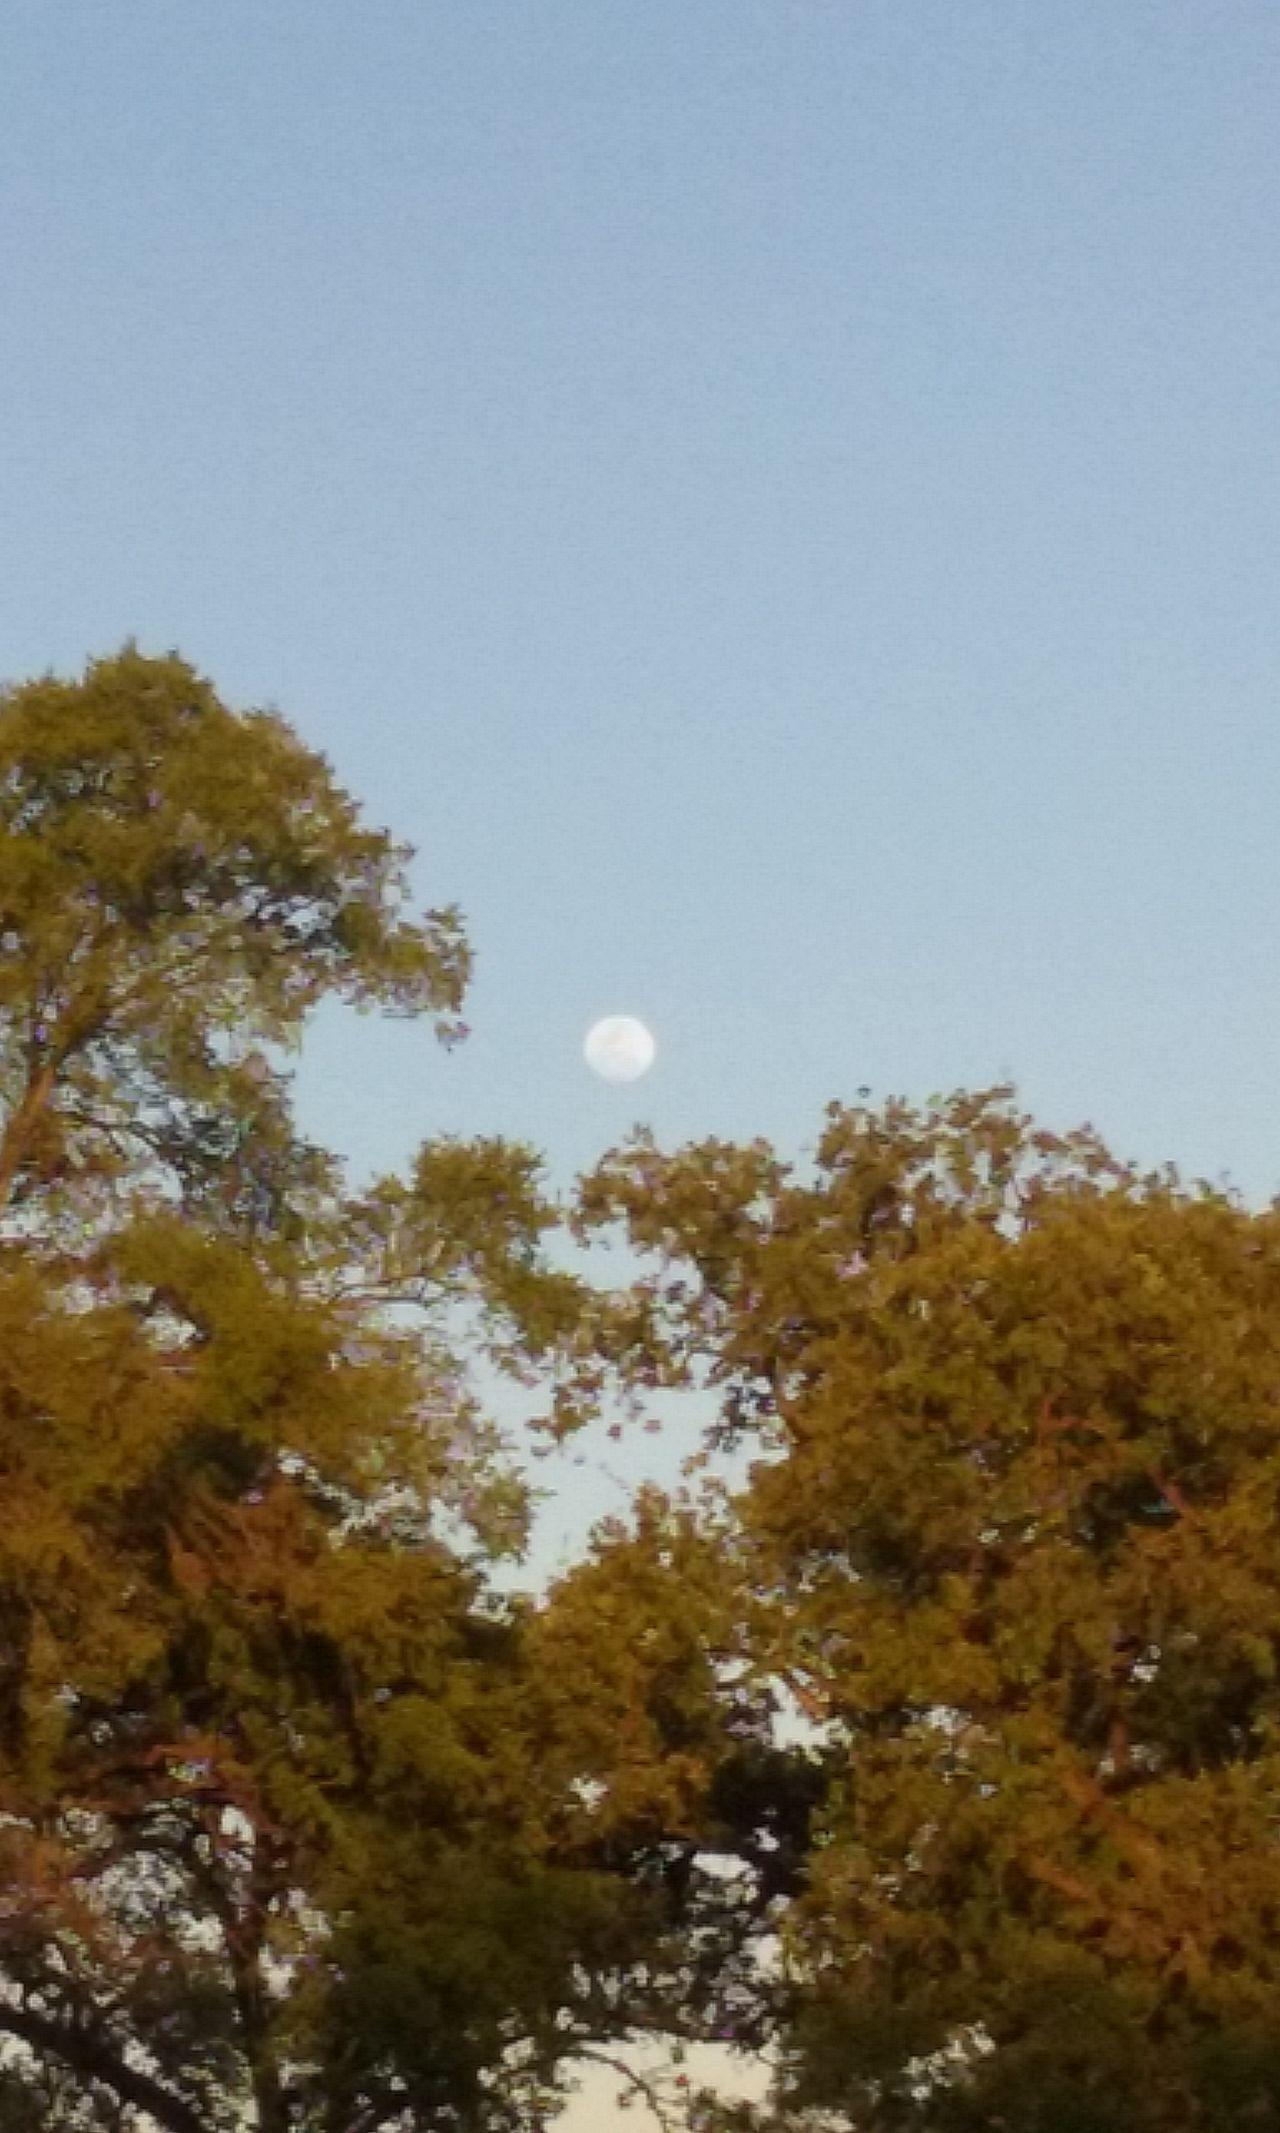 Moon Moon Shots Moon_collection Moonphotography Sunset Sunset_collection Sunset✨trees✨ Trees And Sky Trees And Moon Treescollection Trees Collection Trees! Android Photography Taking Photos Exterior Outdoor Photography